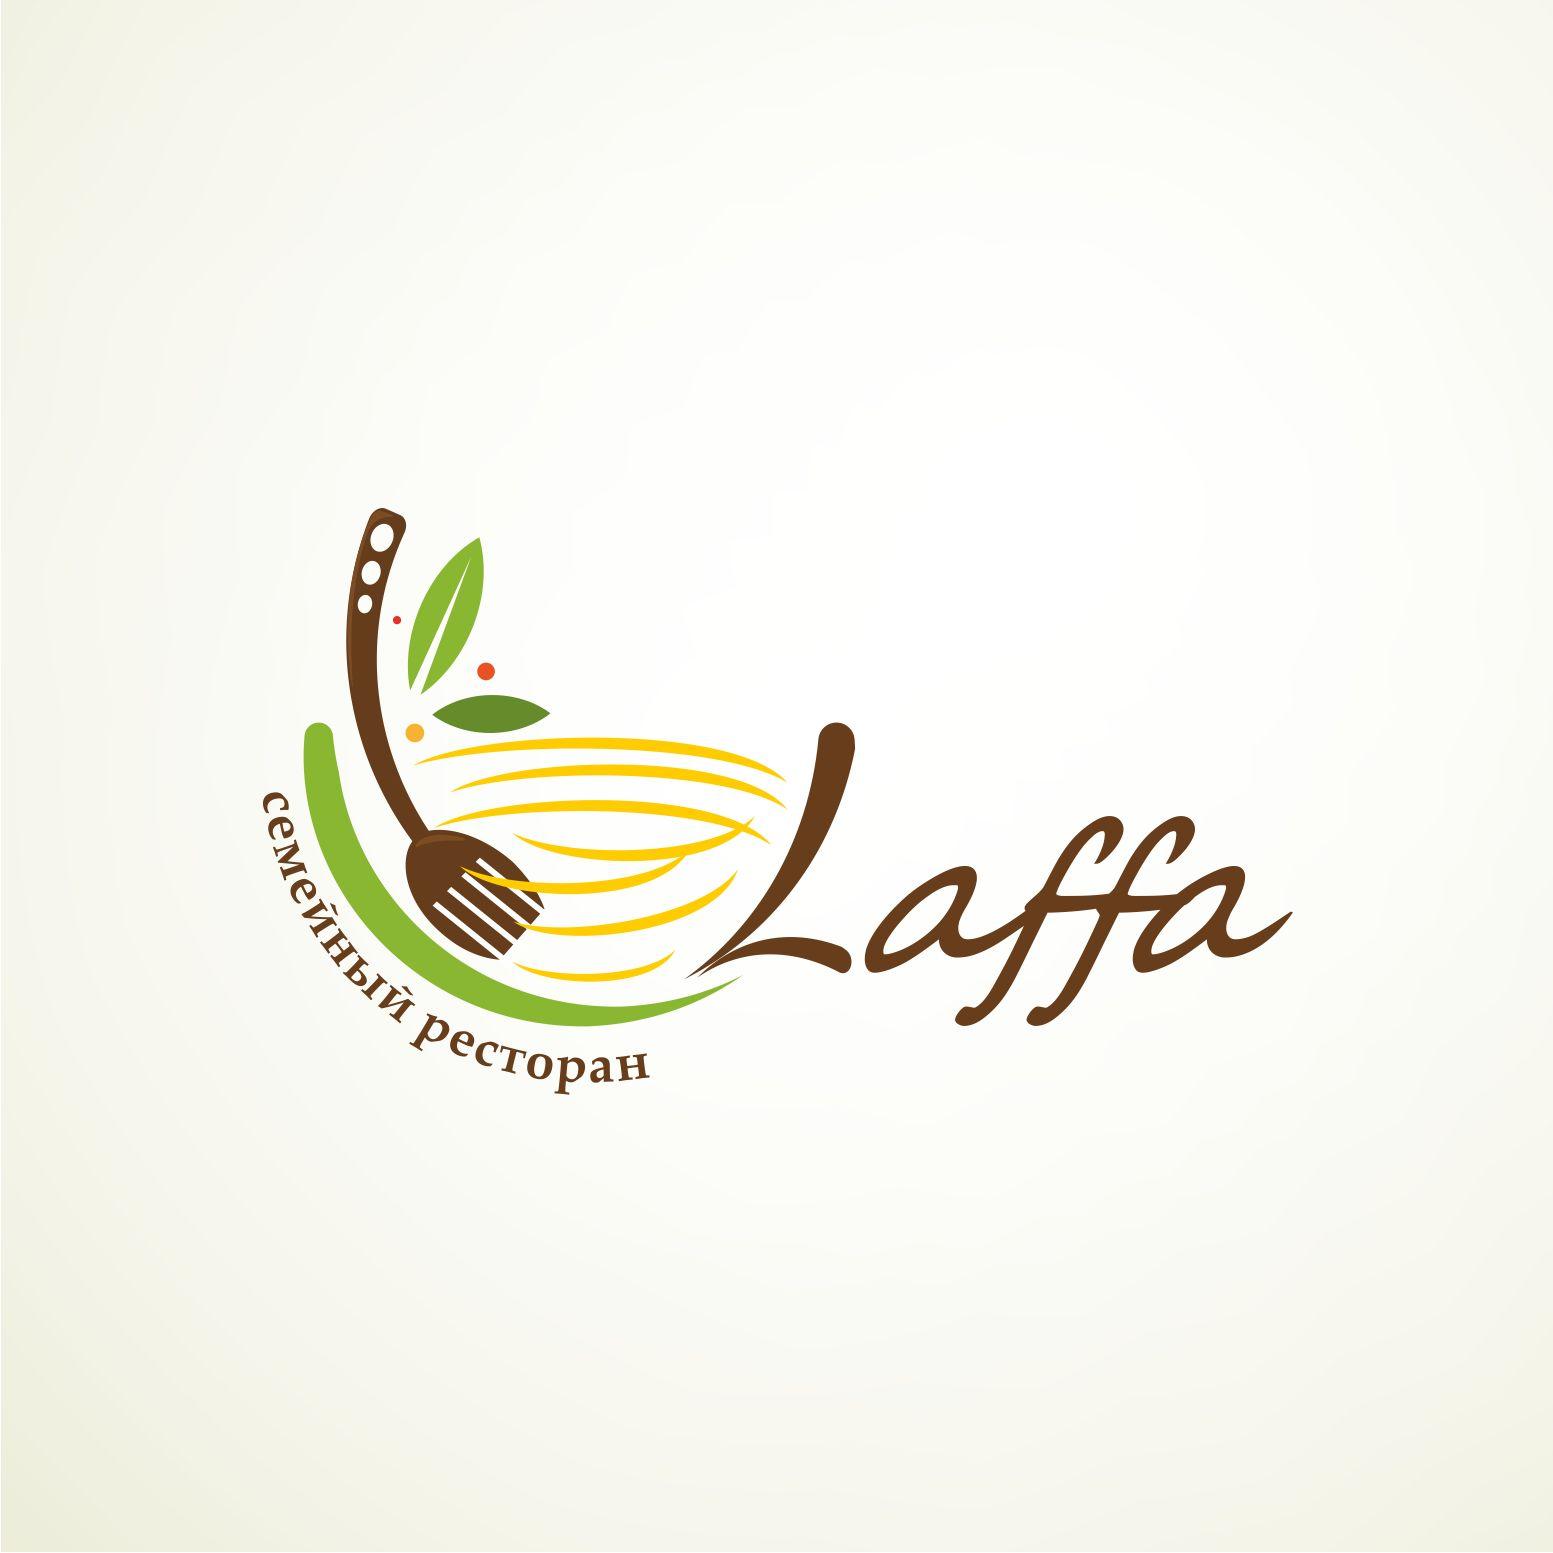 Нужно нарисовать логотип для семейного итальянского ресторан фото f_410554b684b53270.jpg